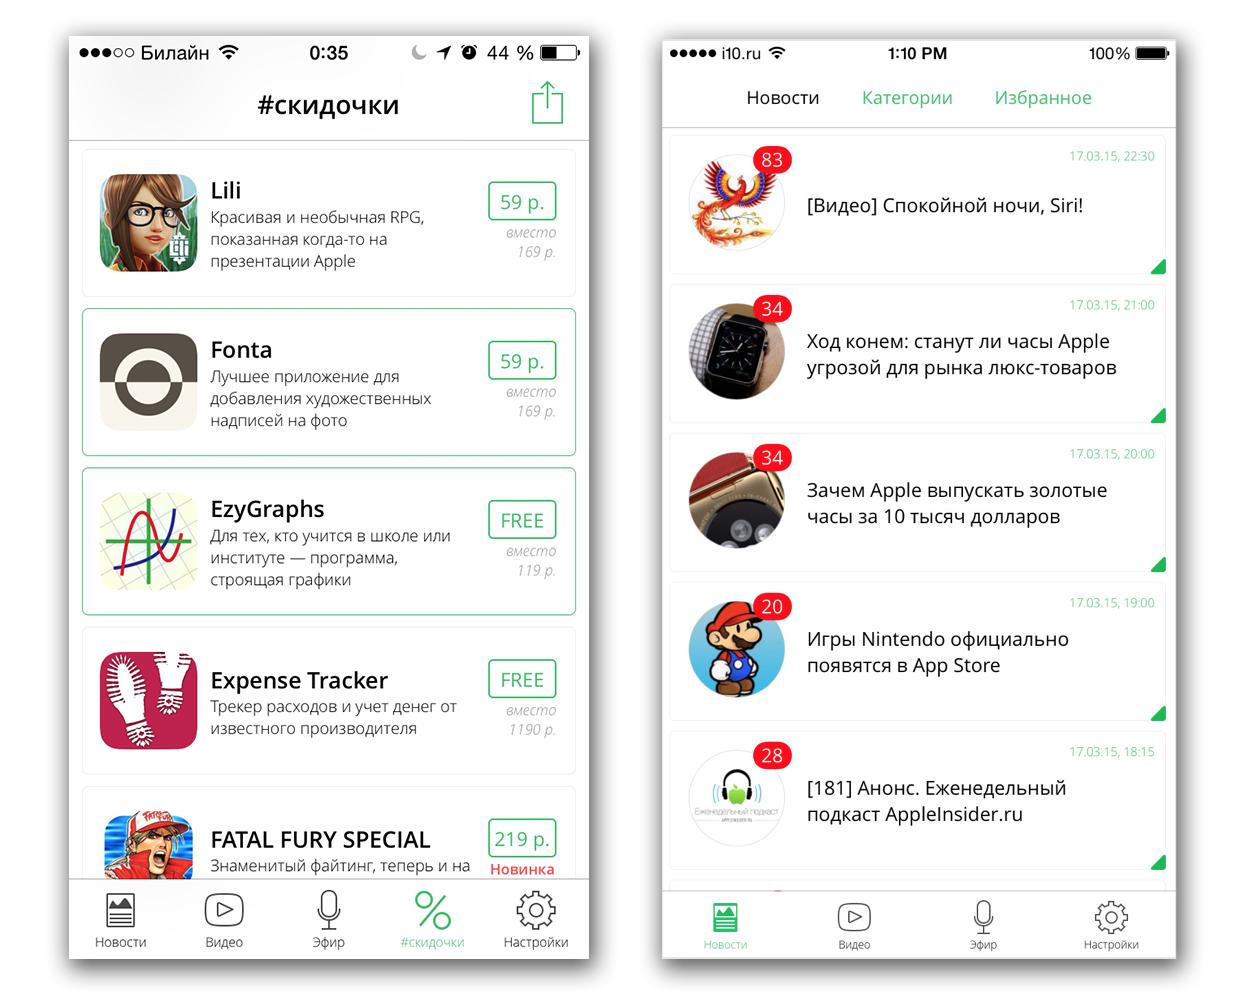 AppleInsider.ru: Apple App Store цензурирует российские тематические СМИ - 2